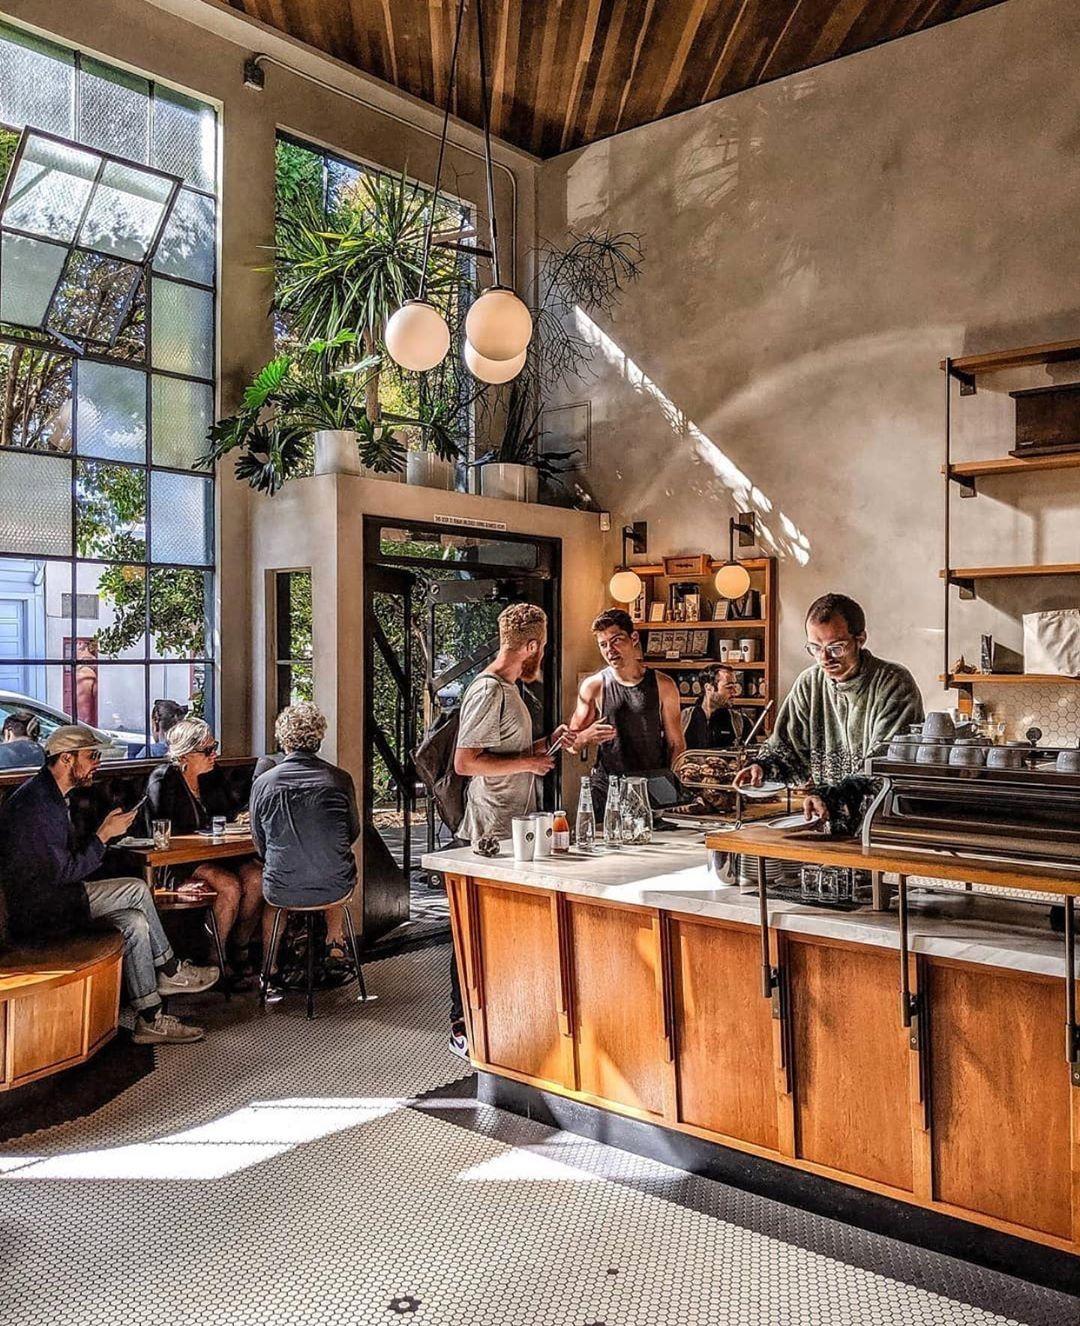 World Of Coffee S Instagram Post Kaldiapp Coffeecornerideas In 2020 Instagram Instagram Posts Coffee Corner